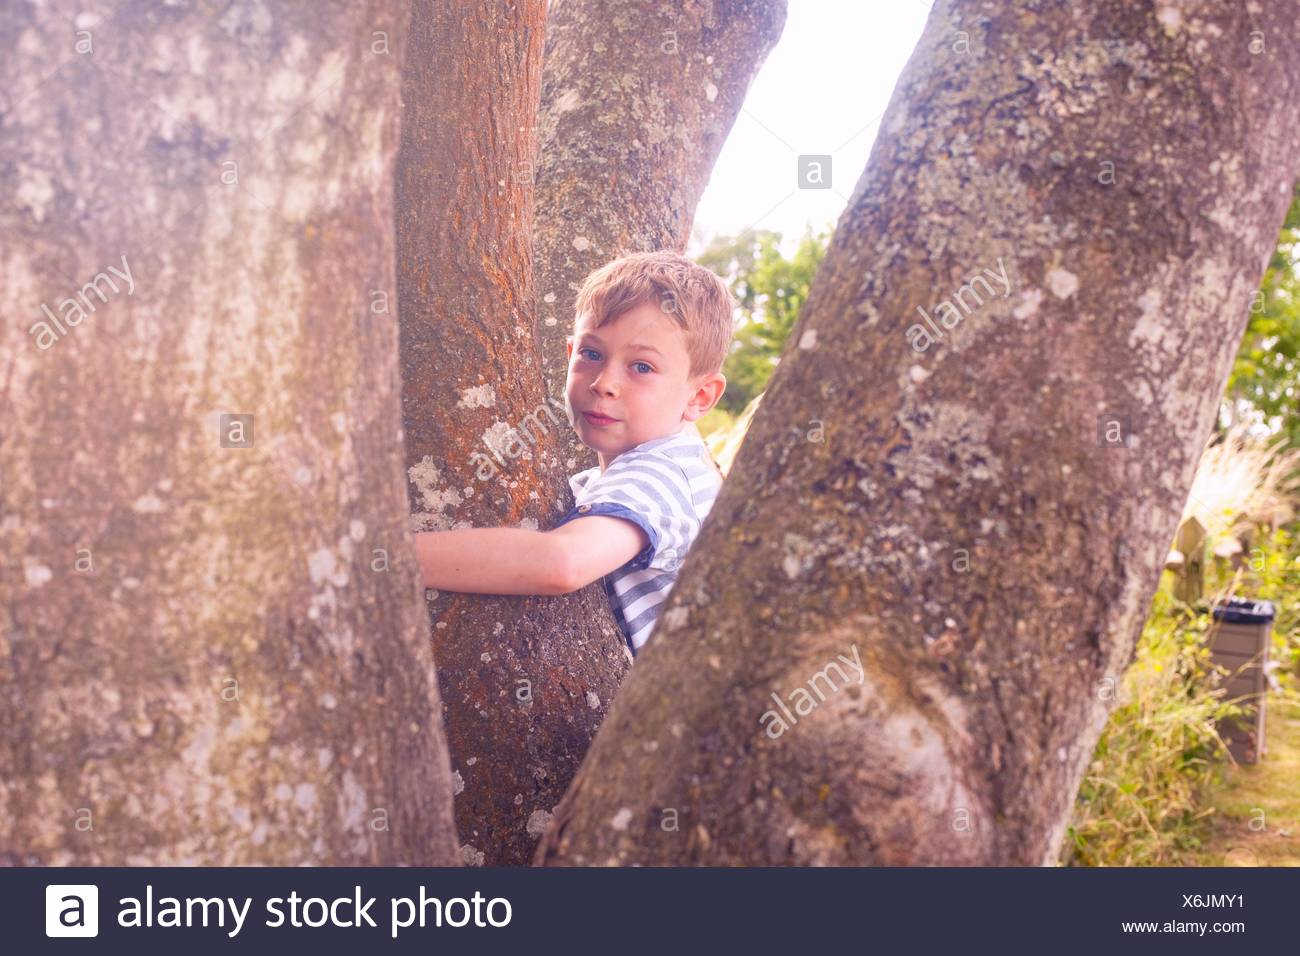 Portrait of boy between tree trunks - Stock Image